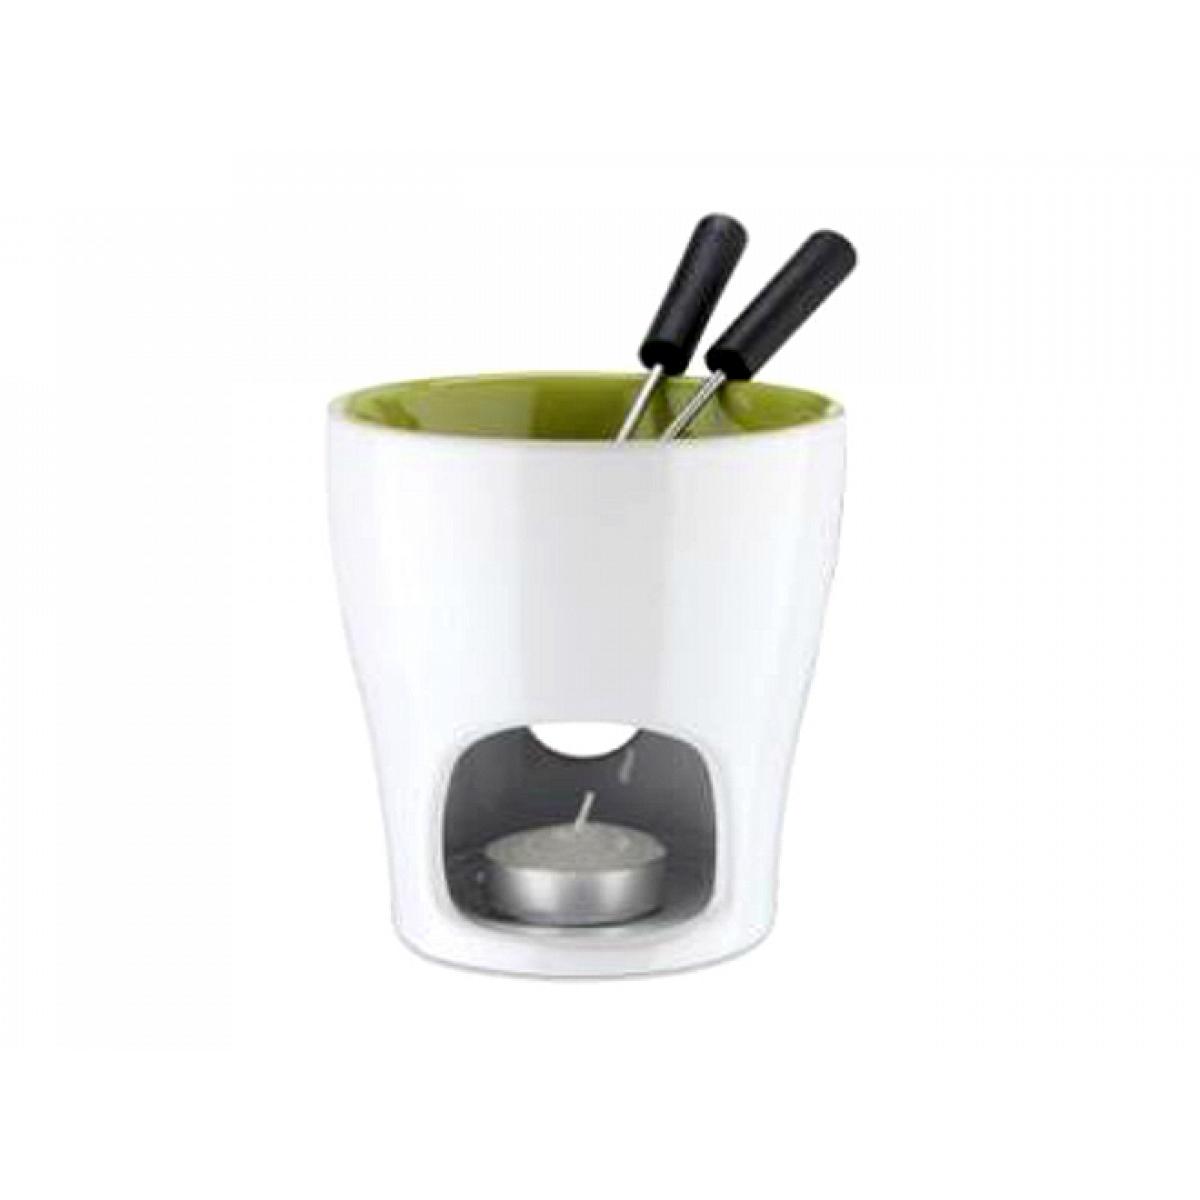 5 teiliges schoko fondue eva collection innen gr n eva. Black Bedroom Furniture Sets. Home Design Ideas